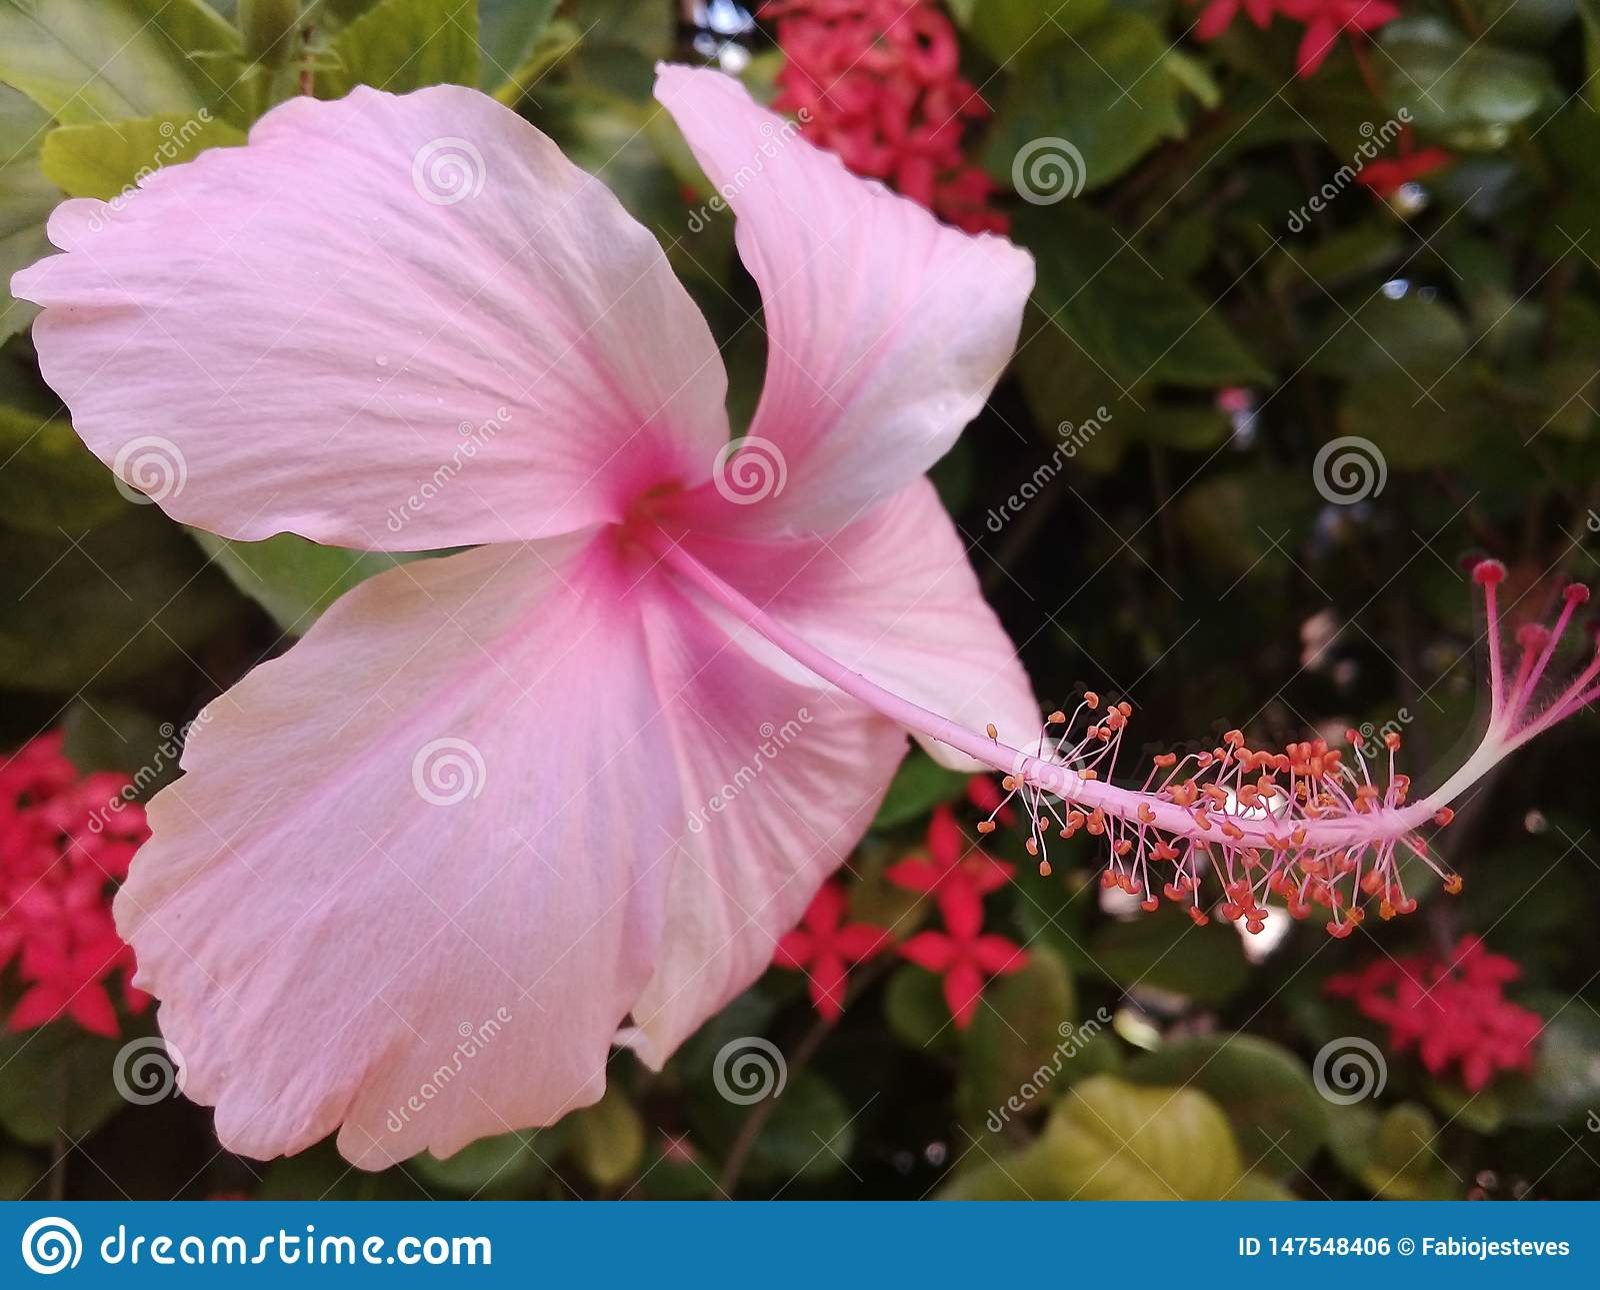 Soft pink hibiscus in a garden